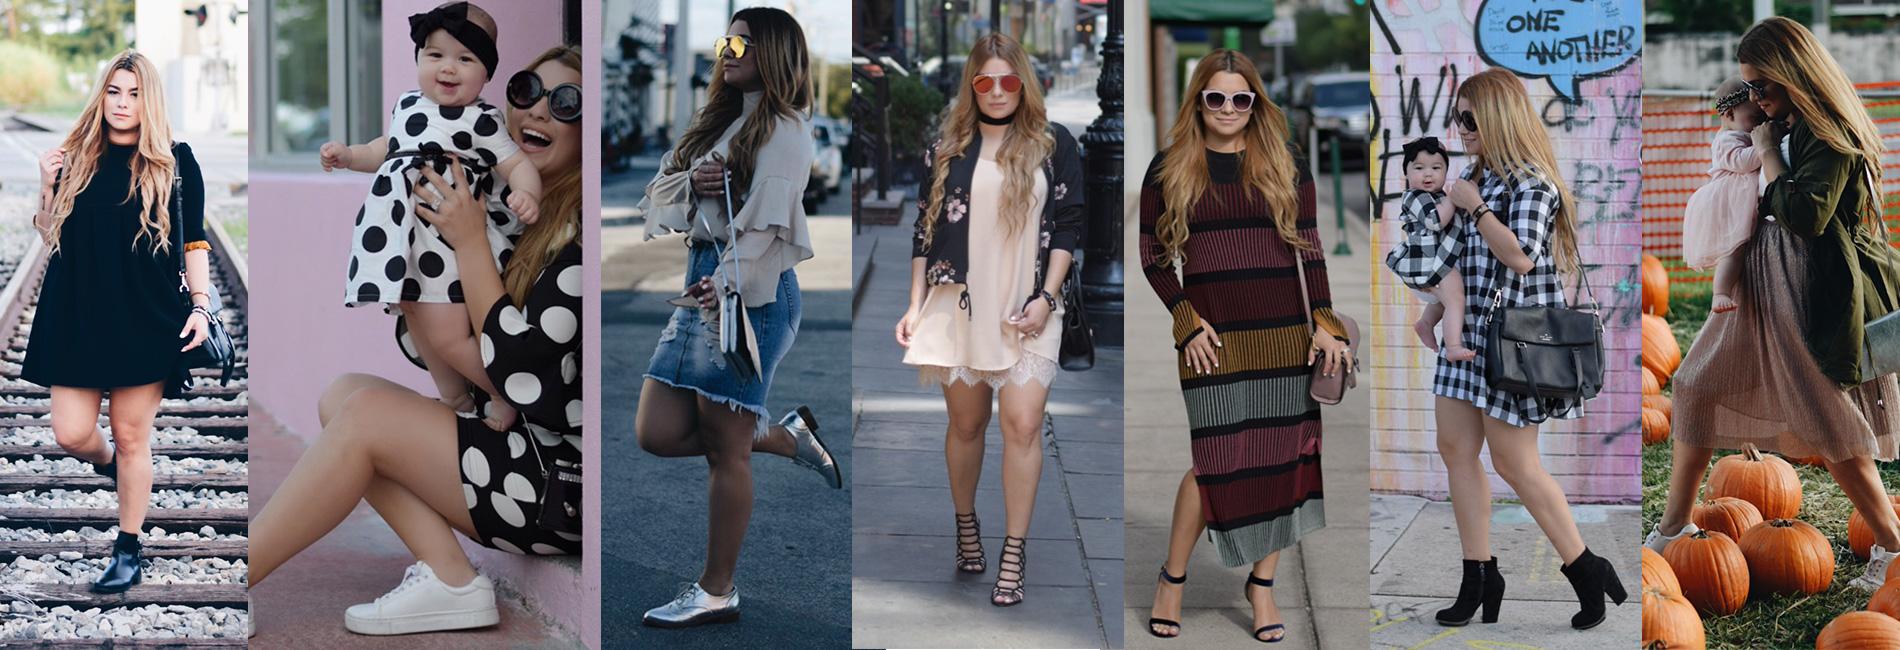 Kim de Oh Lola styles a week!